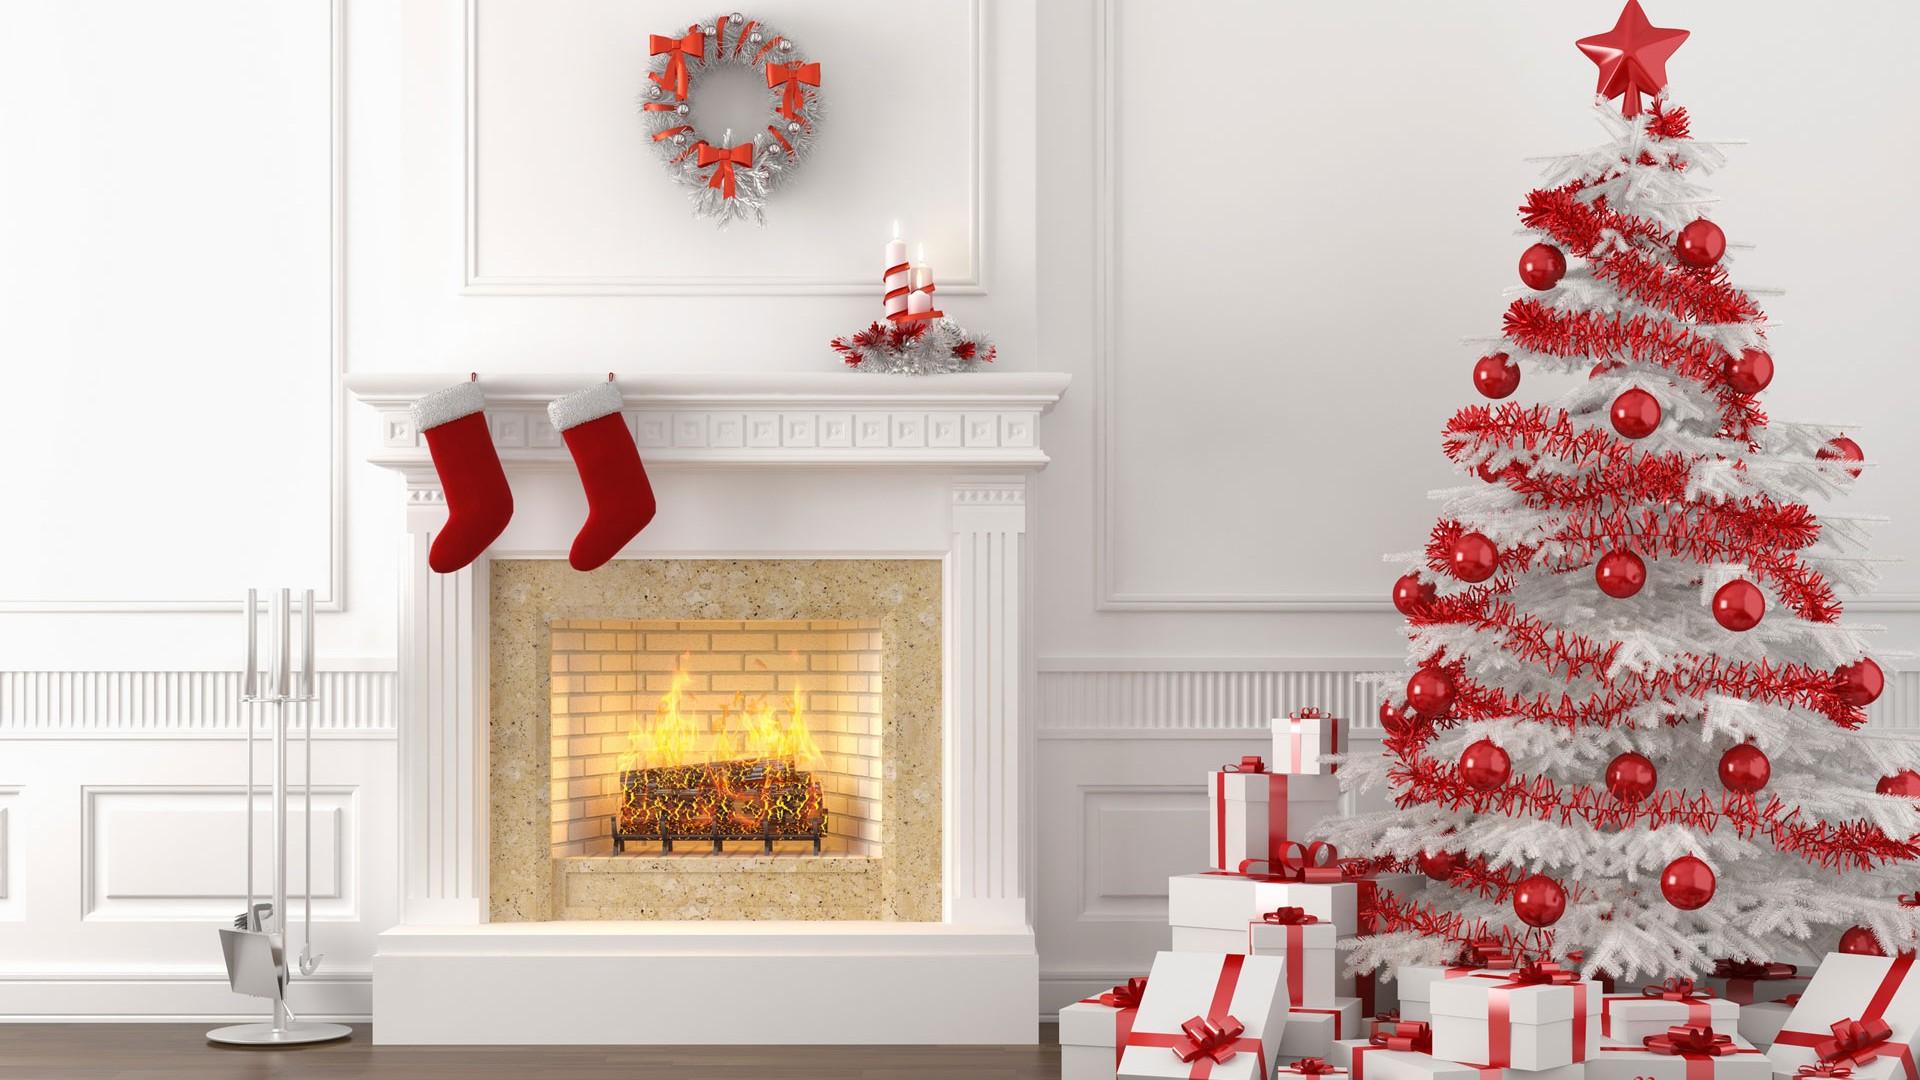 White Christmas Fireplace 1920x1080 1080p Wallpaper